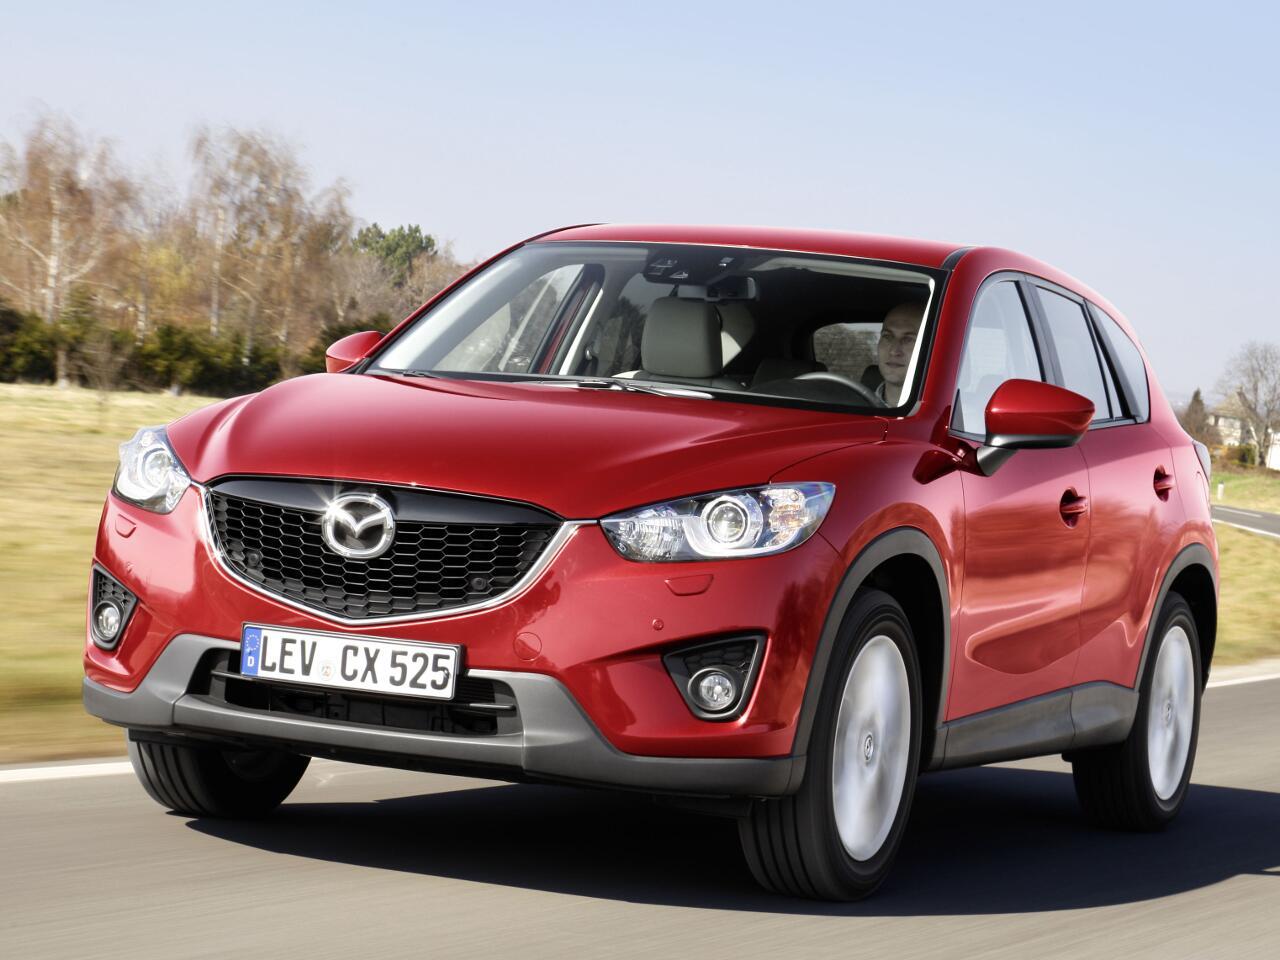 Bild zu 14. Platz: Mazda CX-5